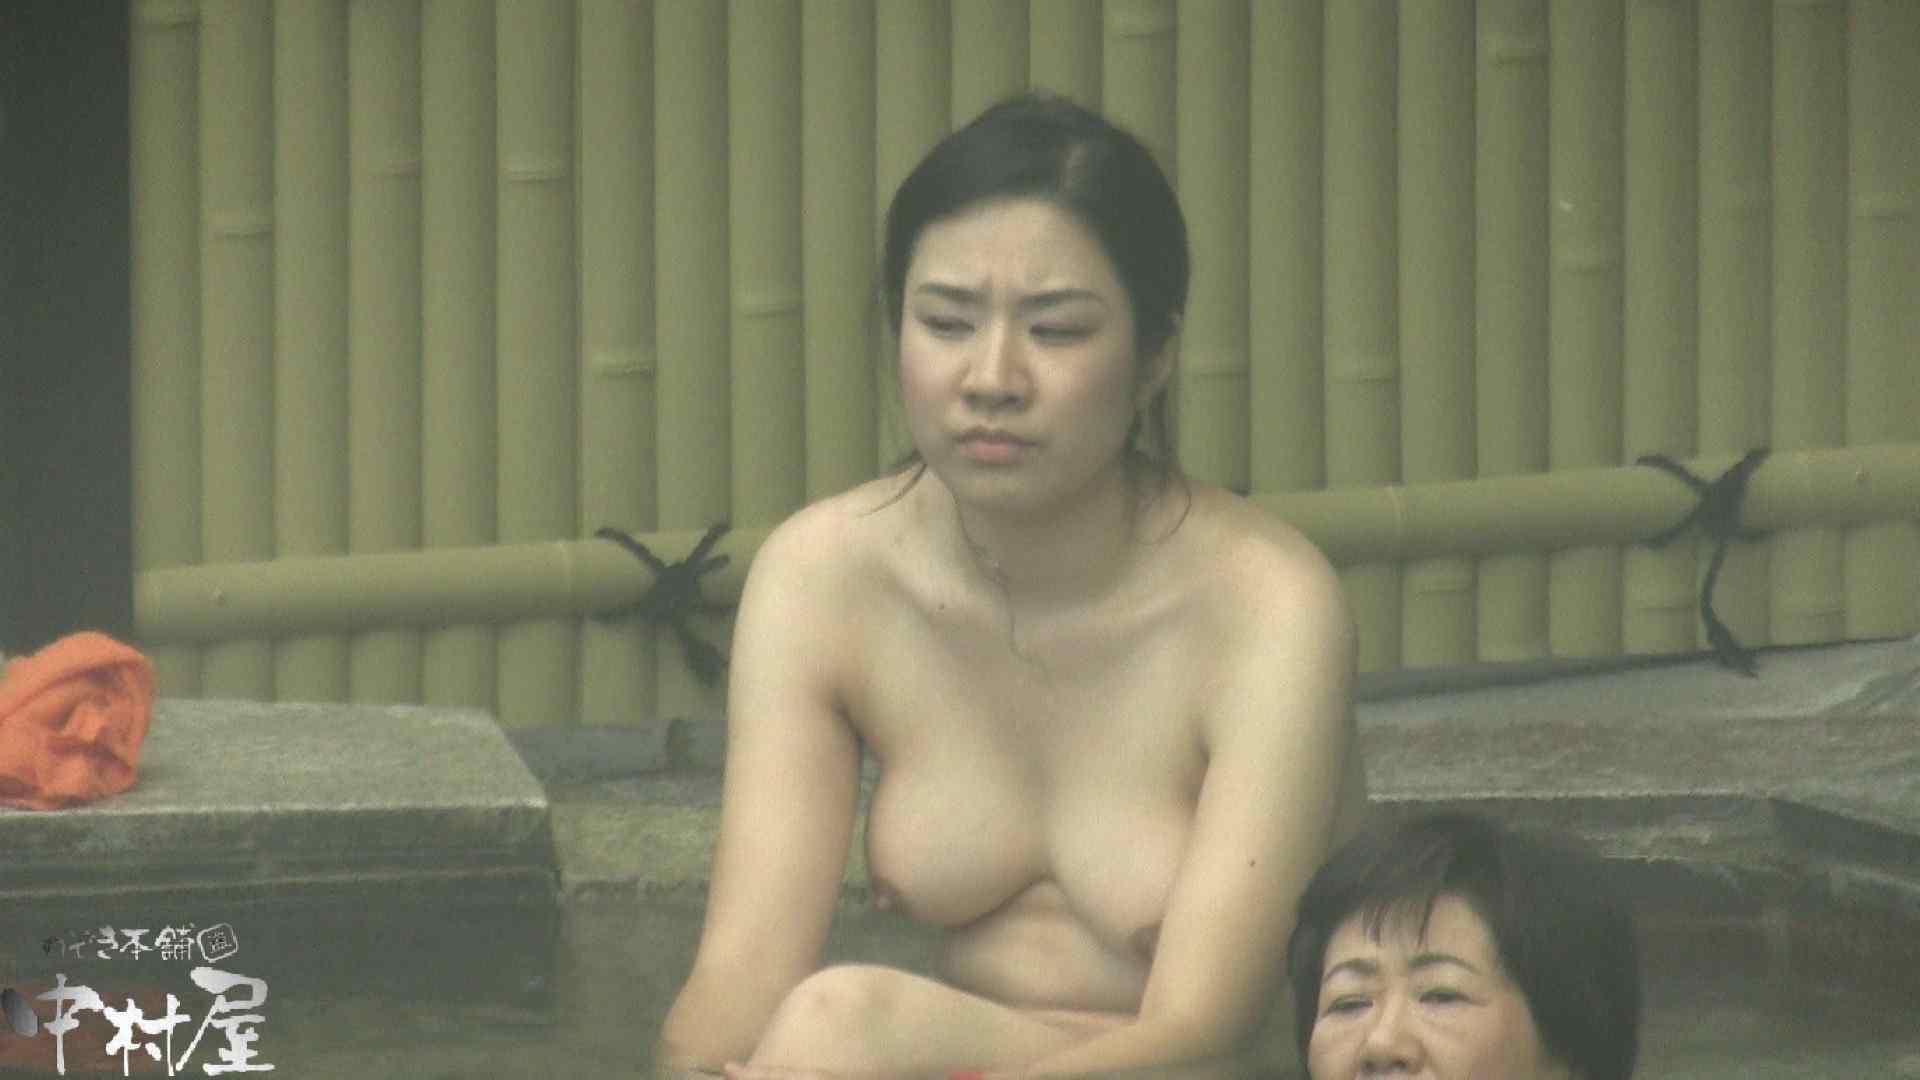 Aquaな露天風呂Vol.913 0 | 0  65連発 31